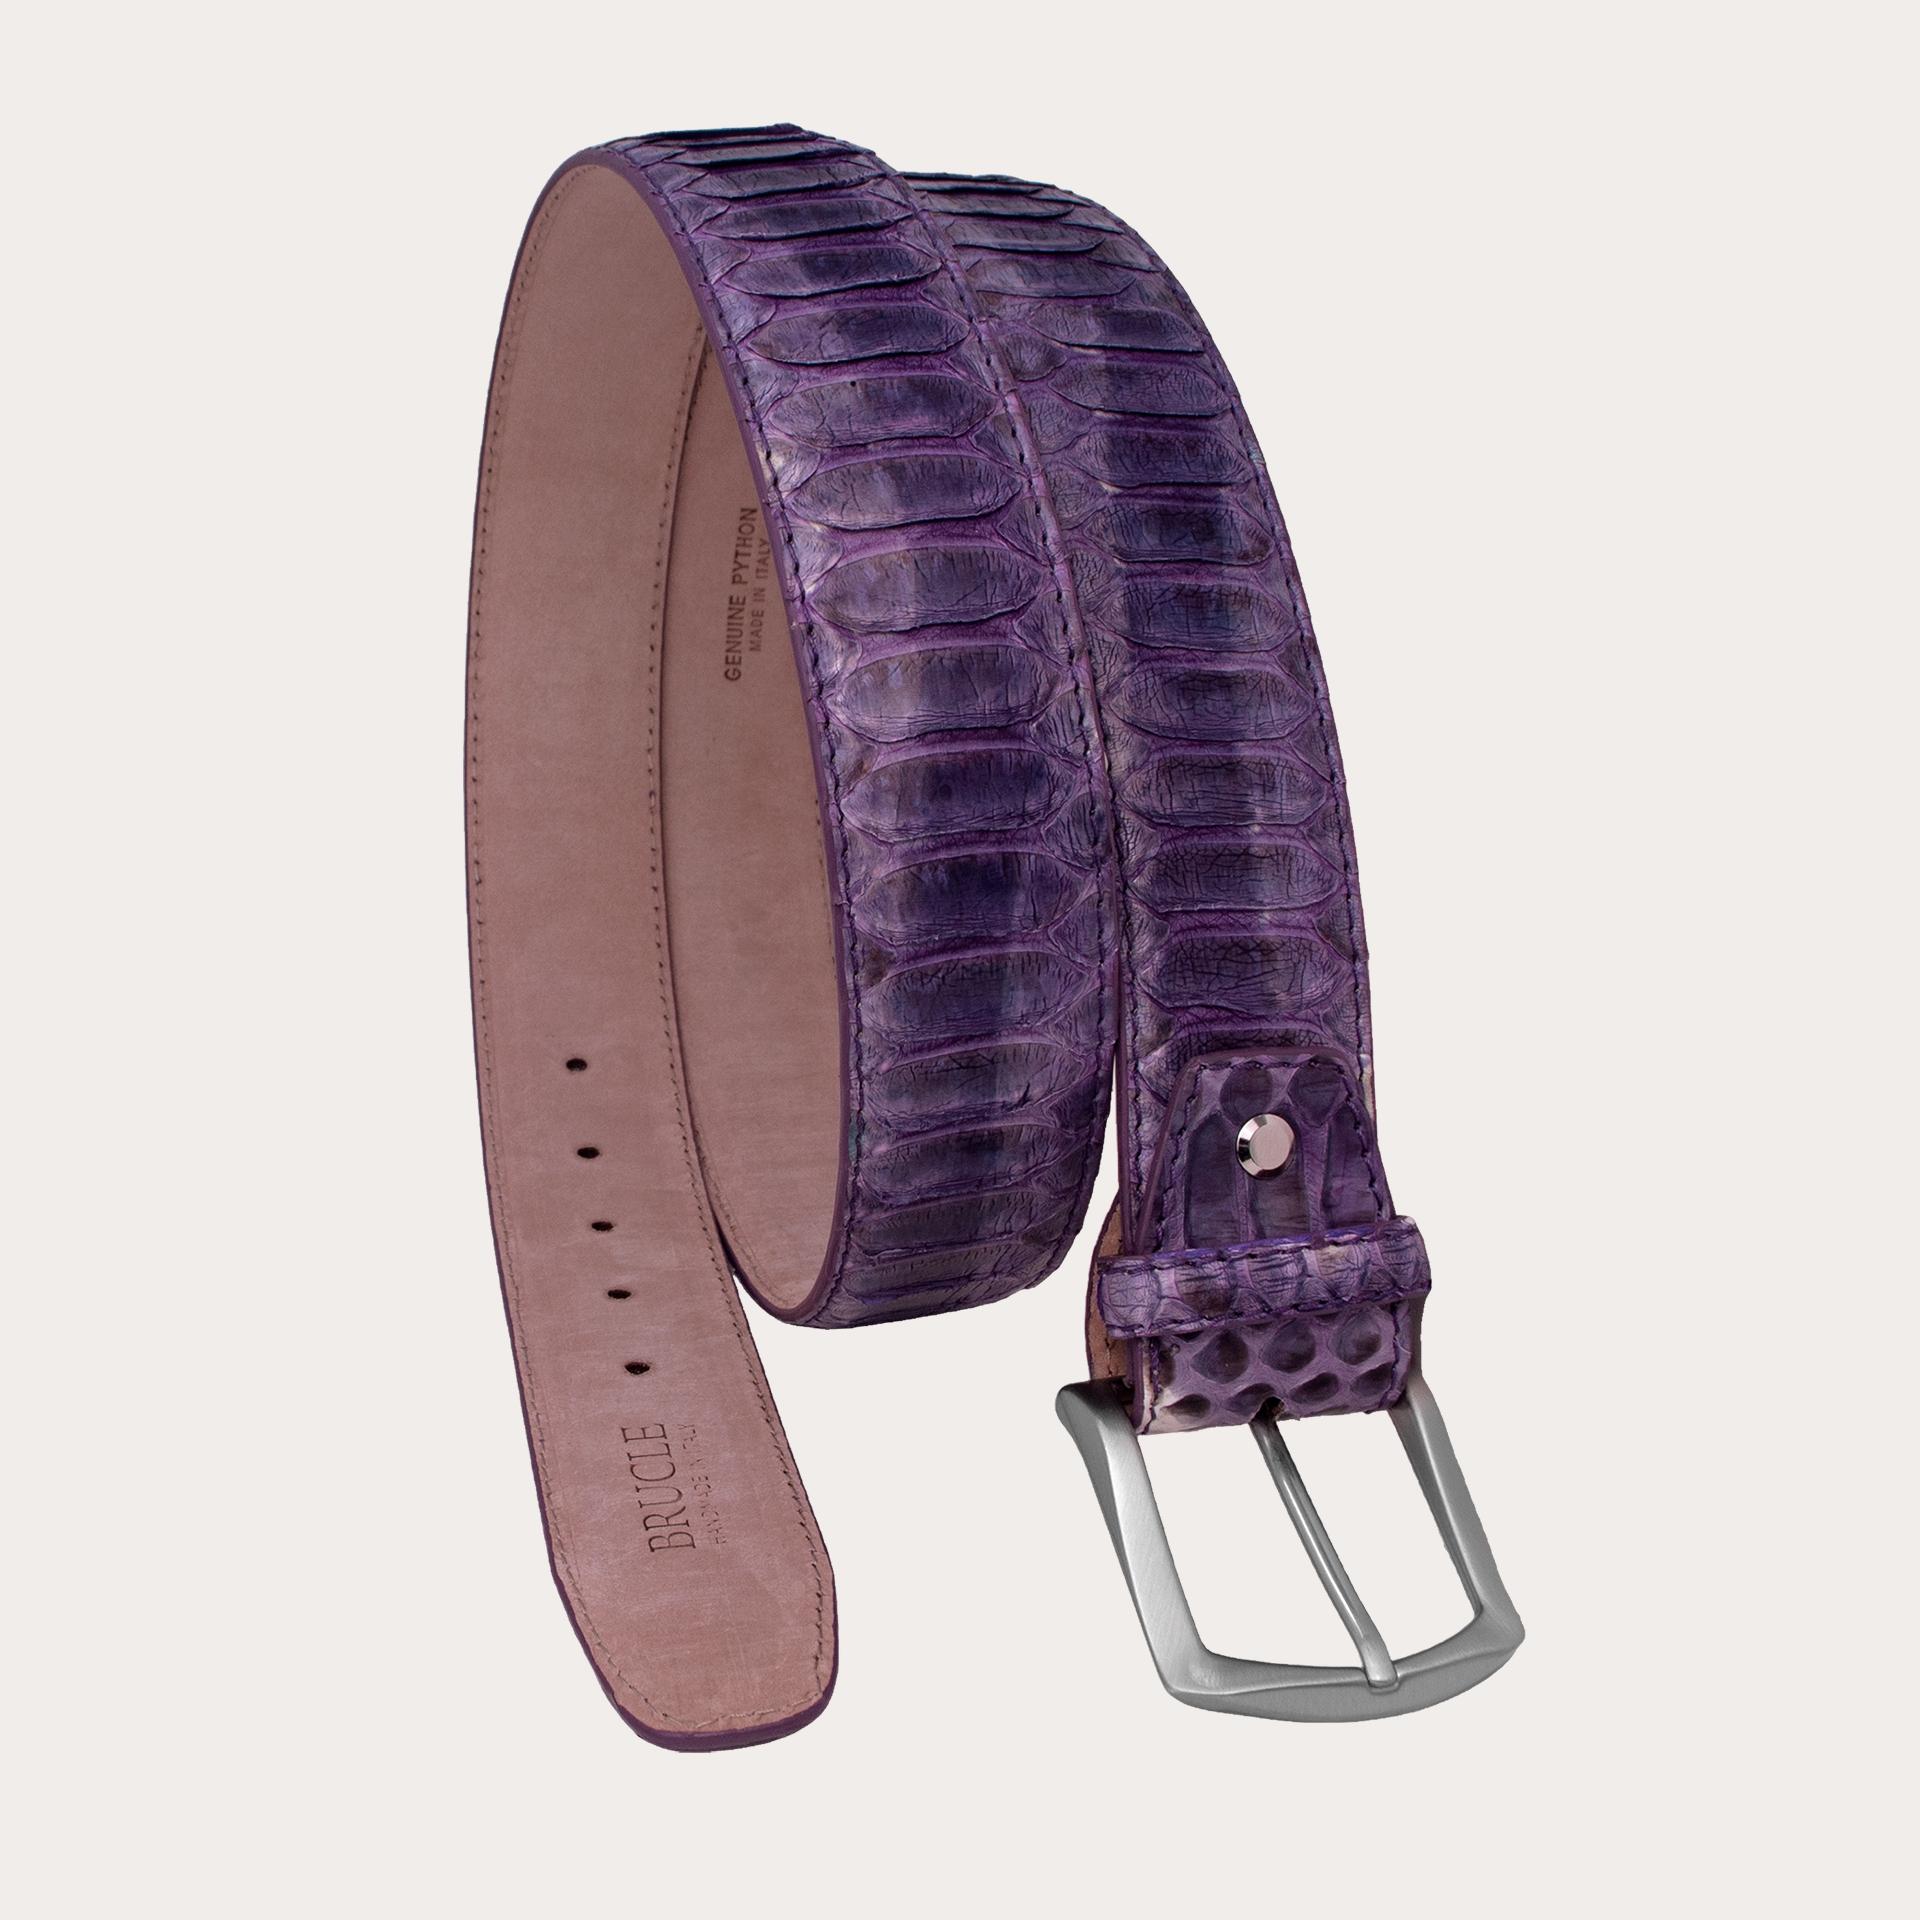 Brucle cintura alta in vero pitone, sfumature viola glicine